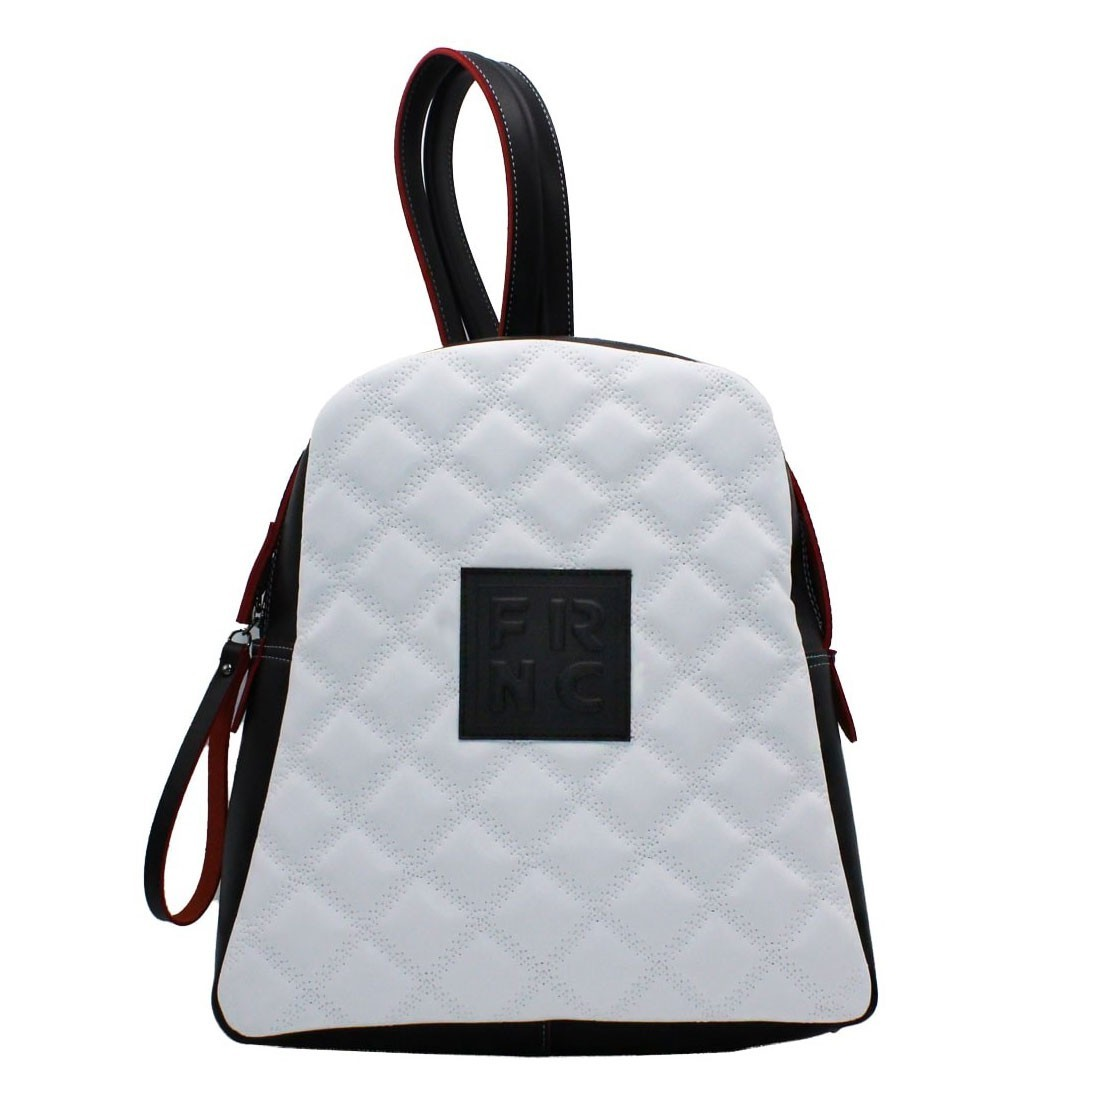 2942f8b0dd FRNC FRANCESCO Τσάντα Γυναικεία Πλάτης-Backpack 1202 Λευκό Καπιτονέ ...